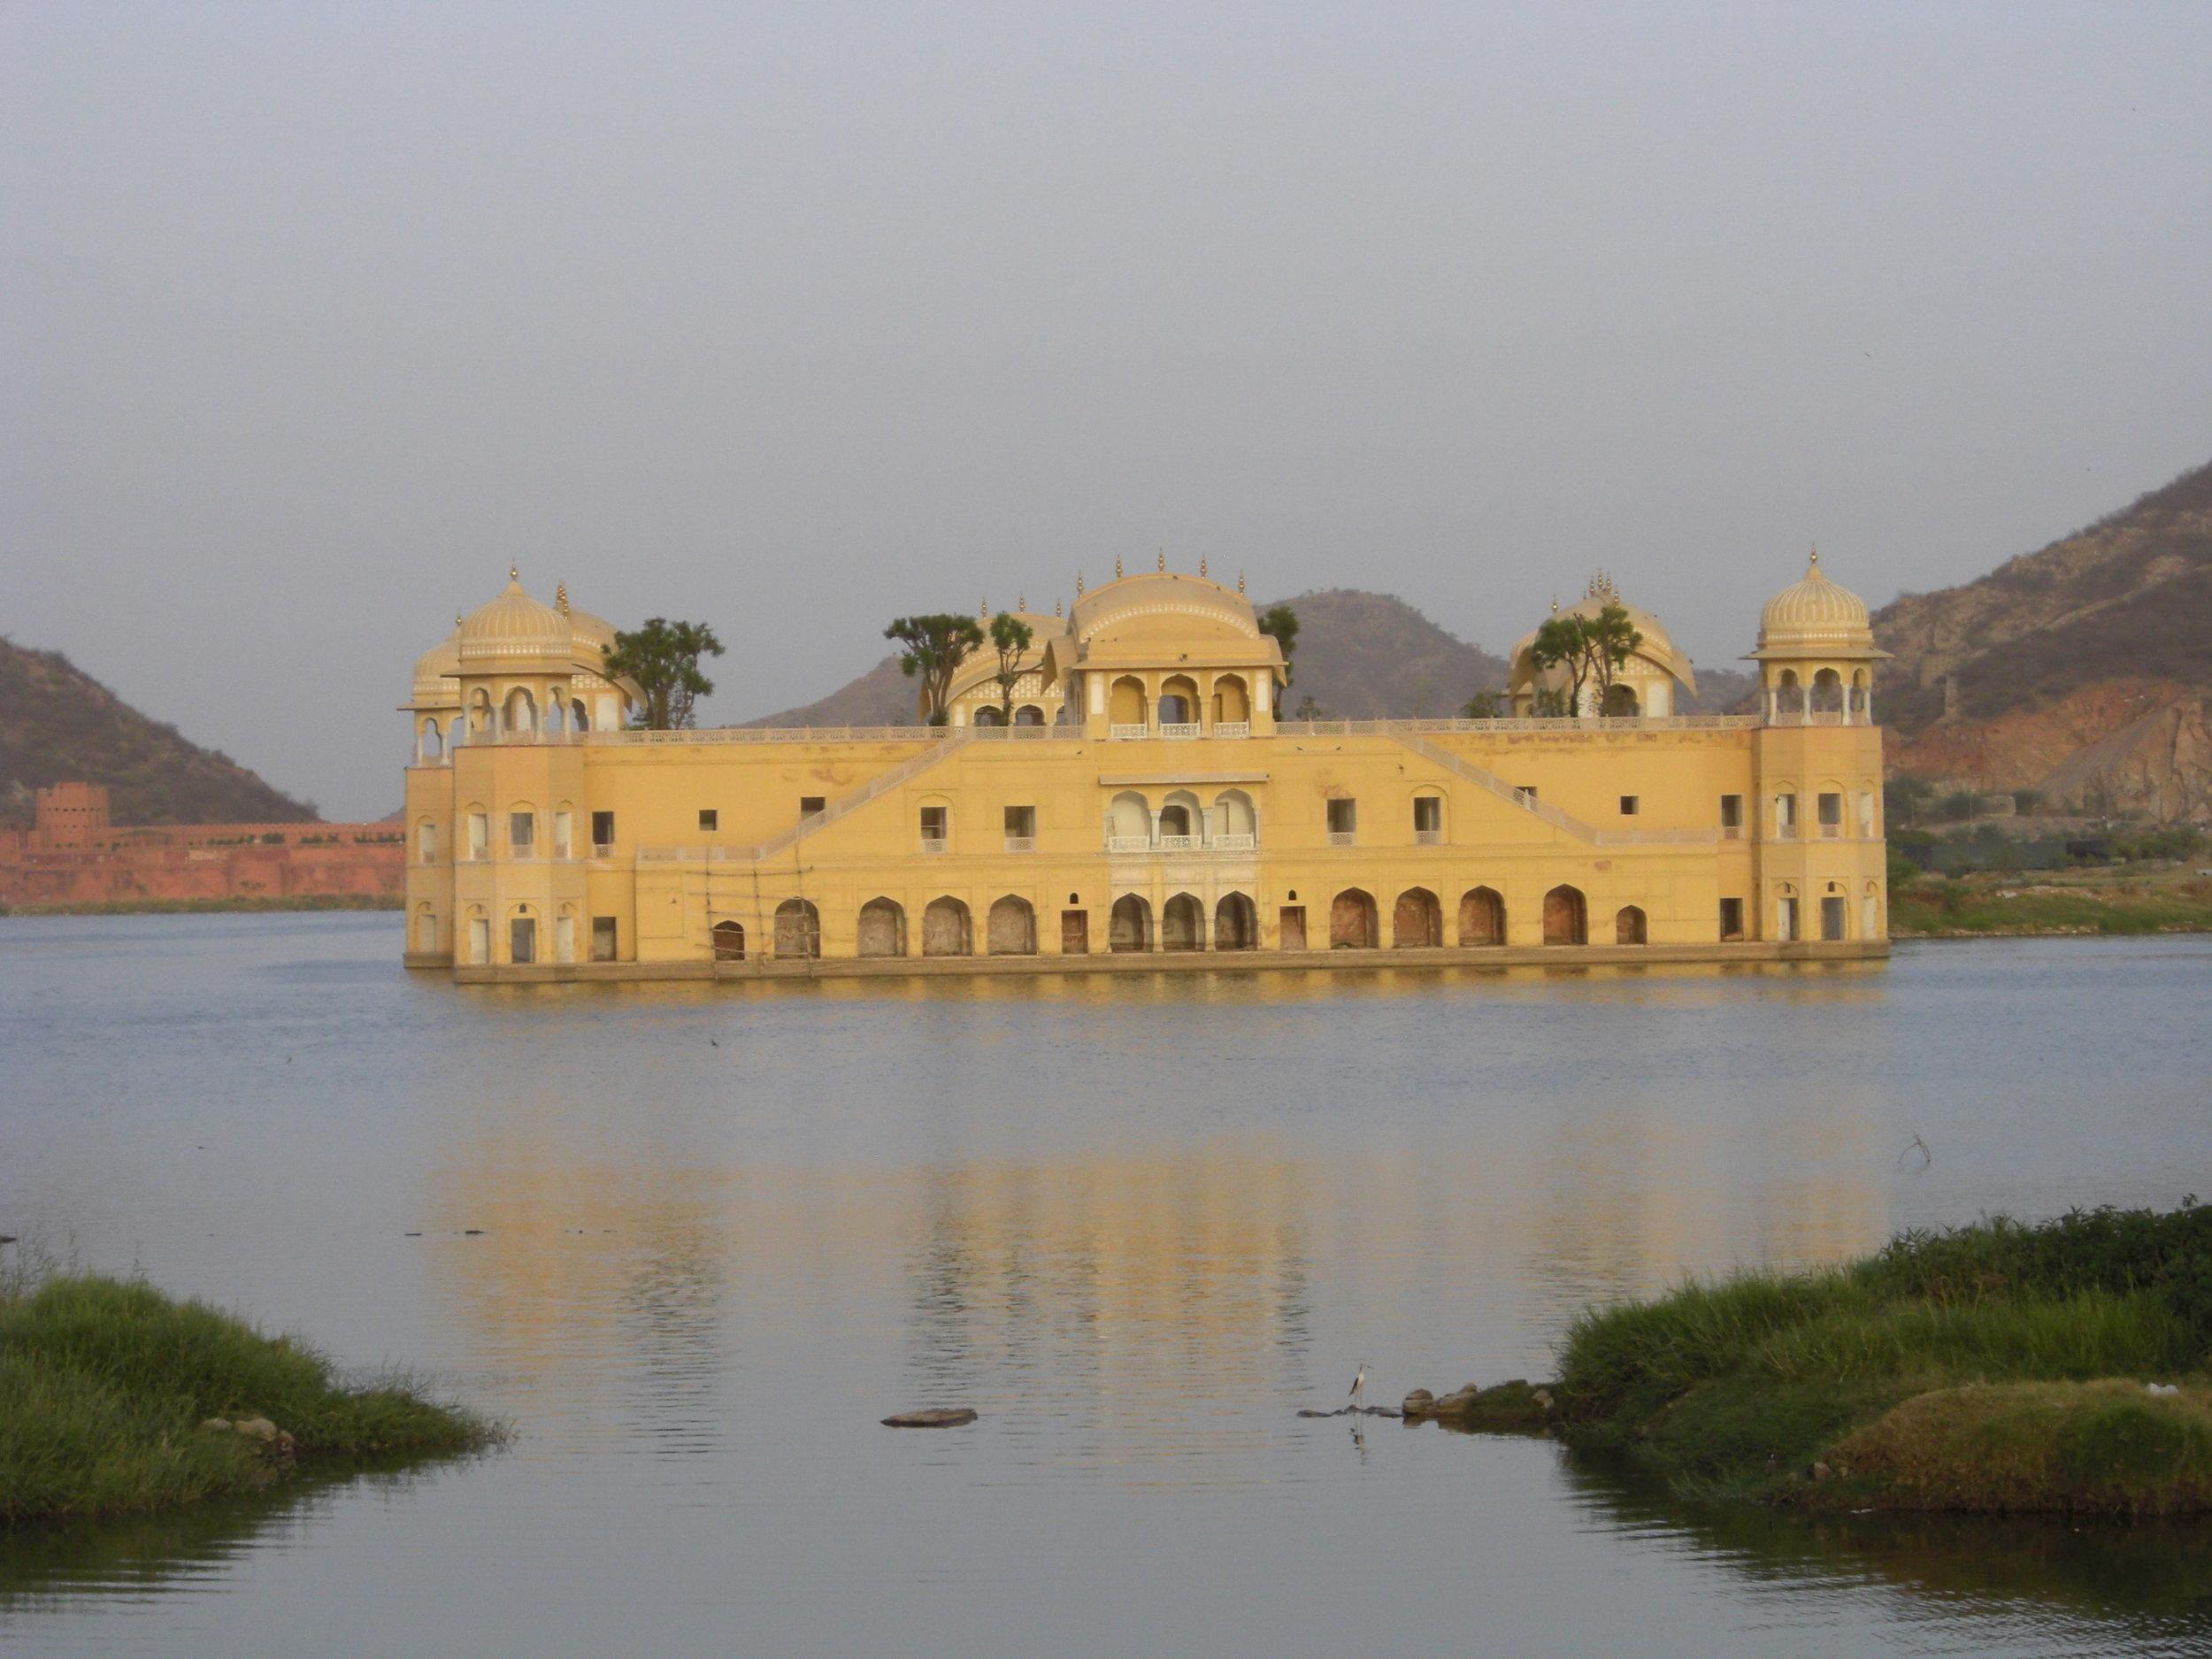 The Jal Mahal, Jaipur, India